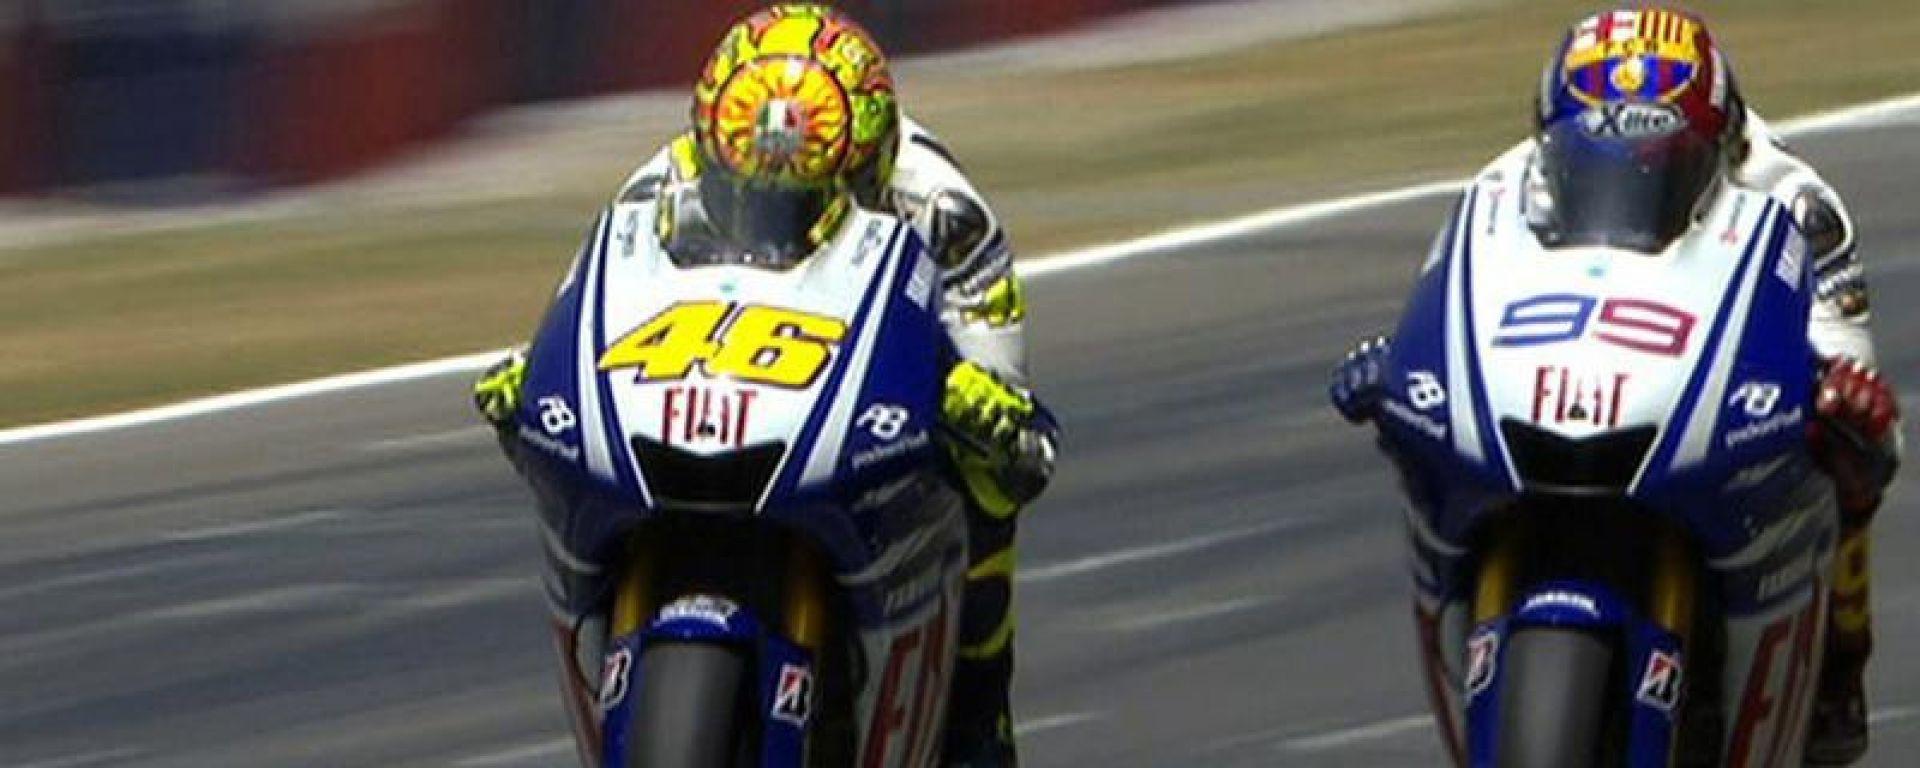 MotoGP, GP Catalunya 2009: il celebre duello tra Valentino Rossi e Jorge Lorenzo (Yamaha)